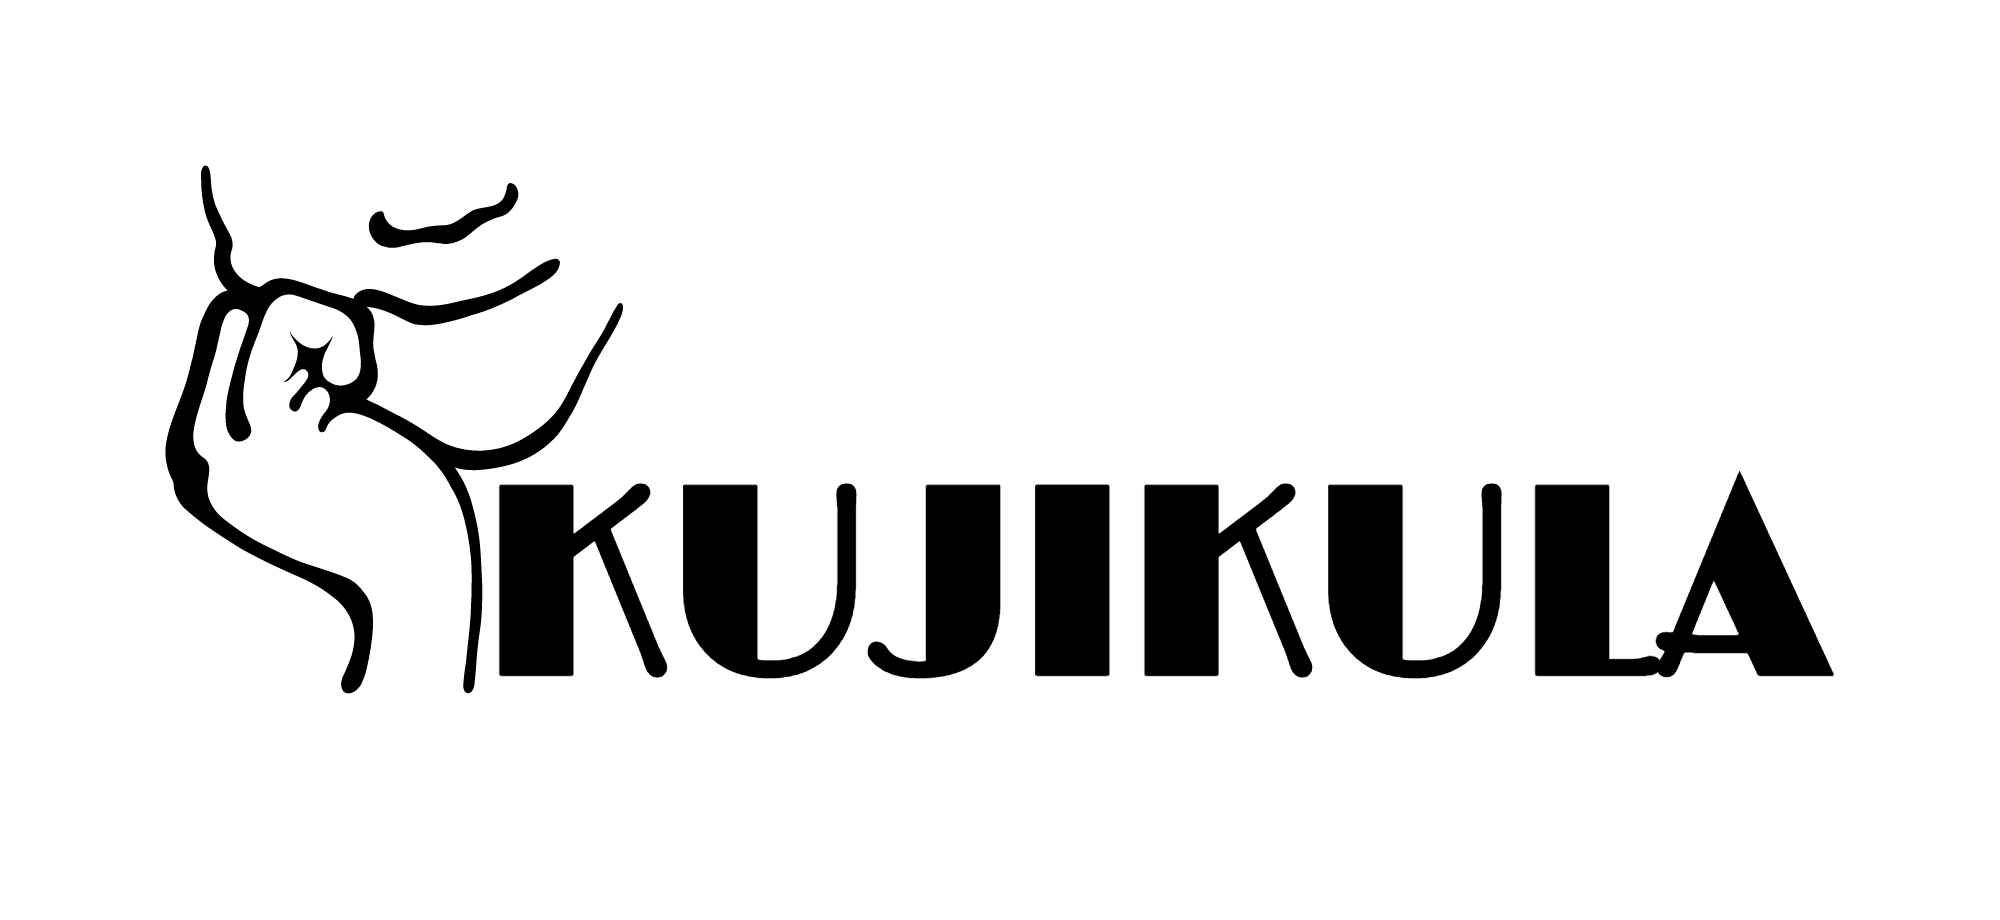 KUJIKULA-logo-black.png